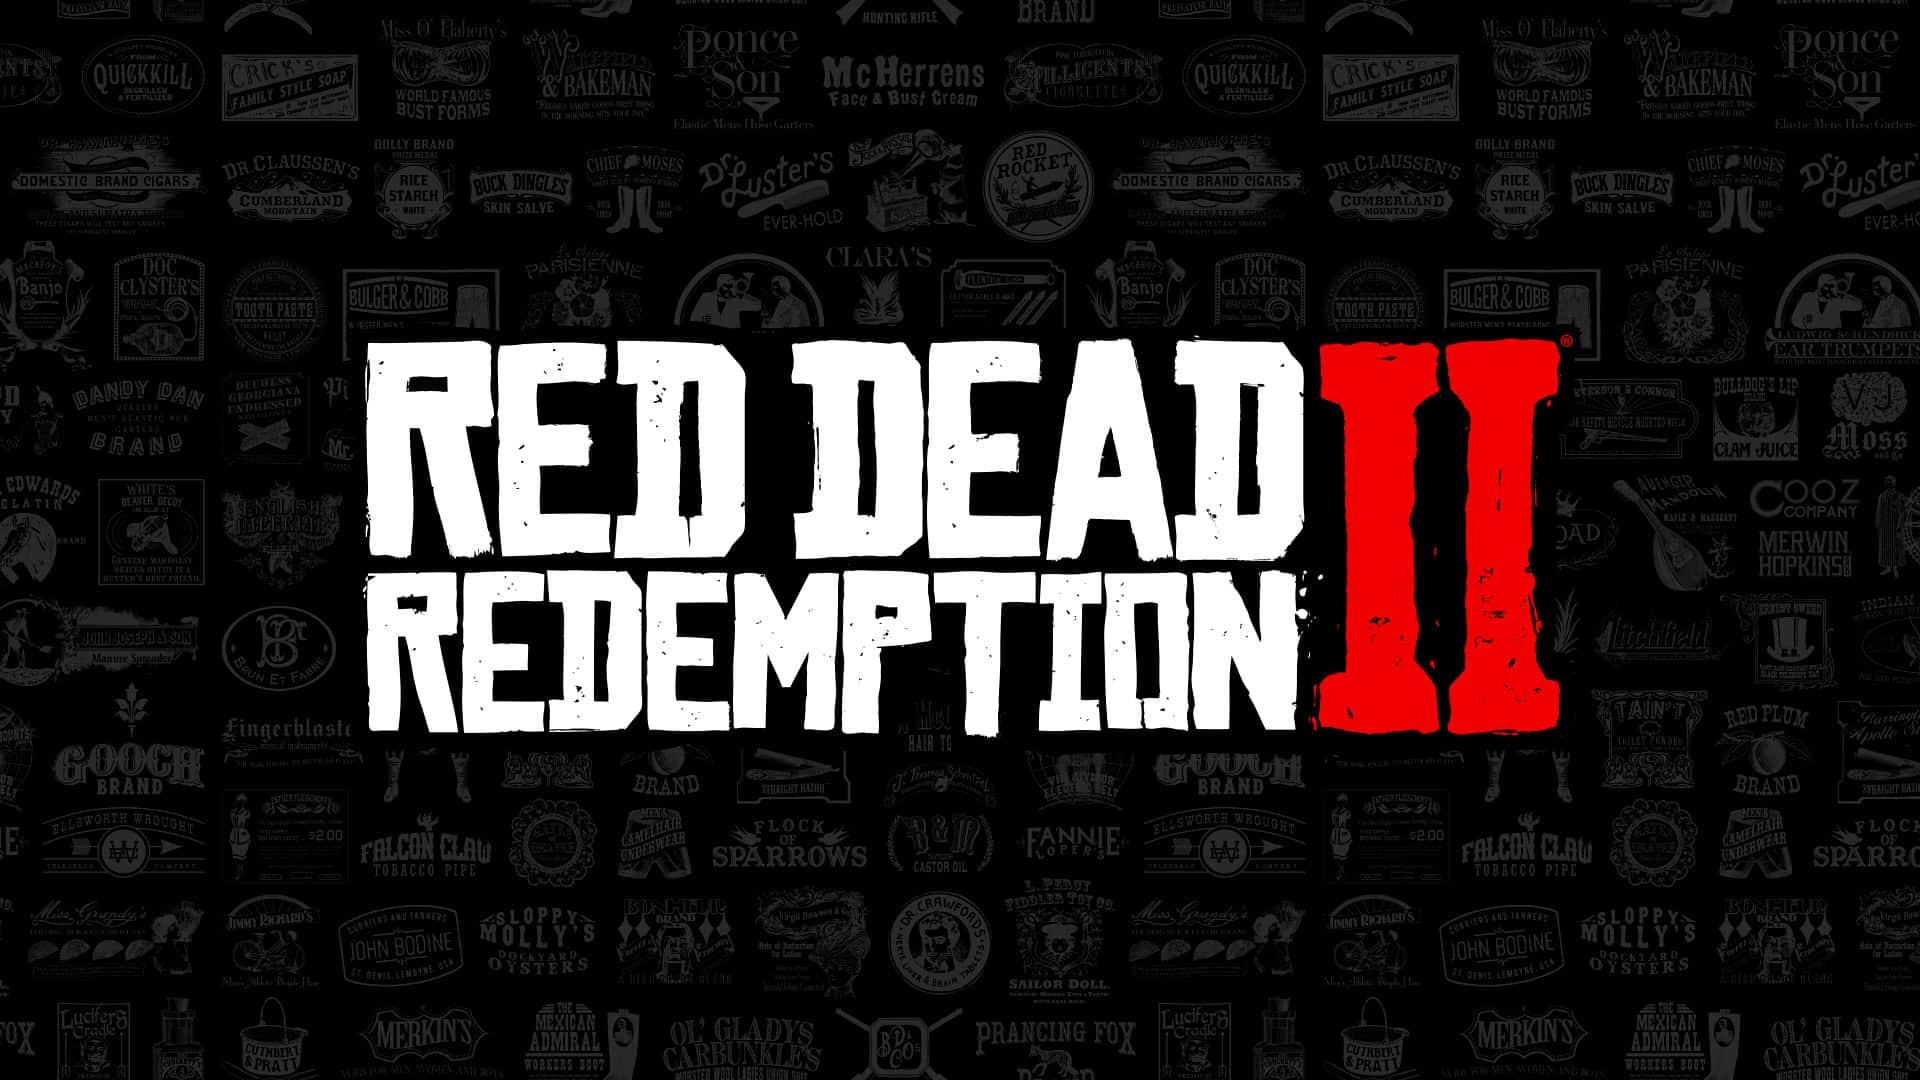 red dead redemption 2 la dur e de vie de l 39 aventure principale sera de 65h. Black Bedroom Furniture Sets. Home Design Ideas